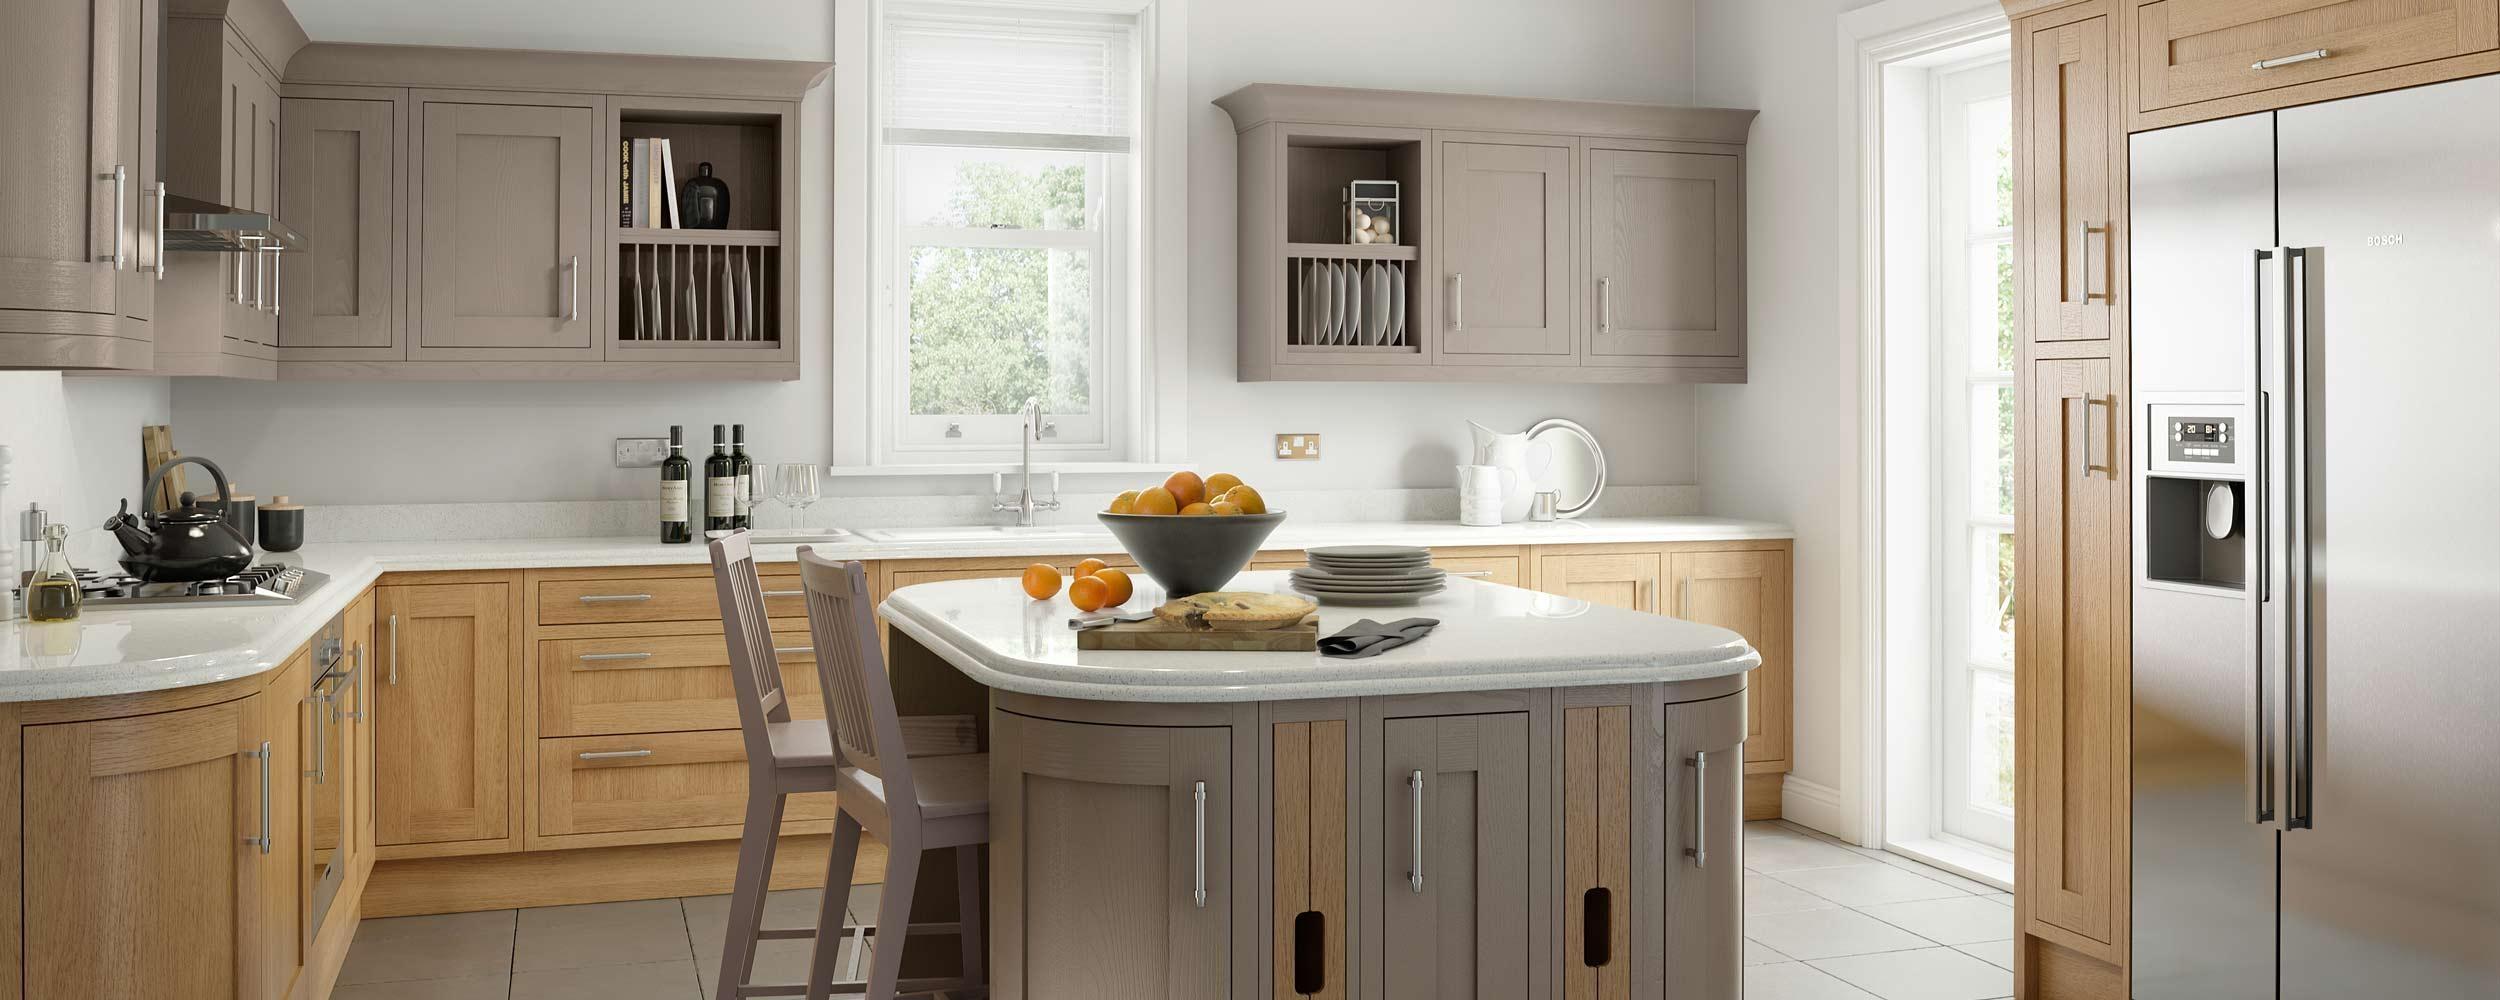 english rose kitchen design glasgow